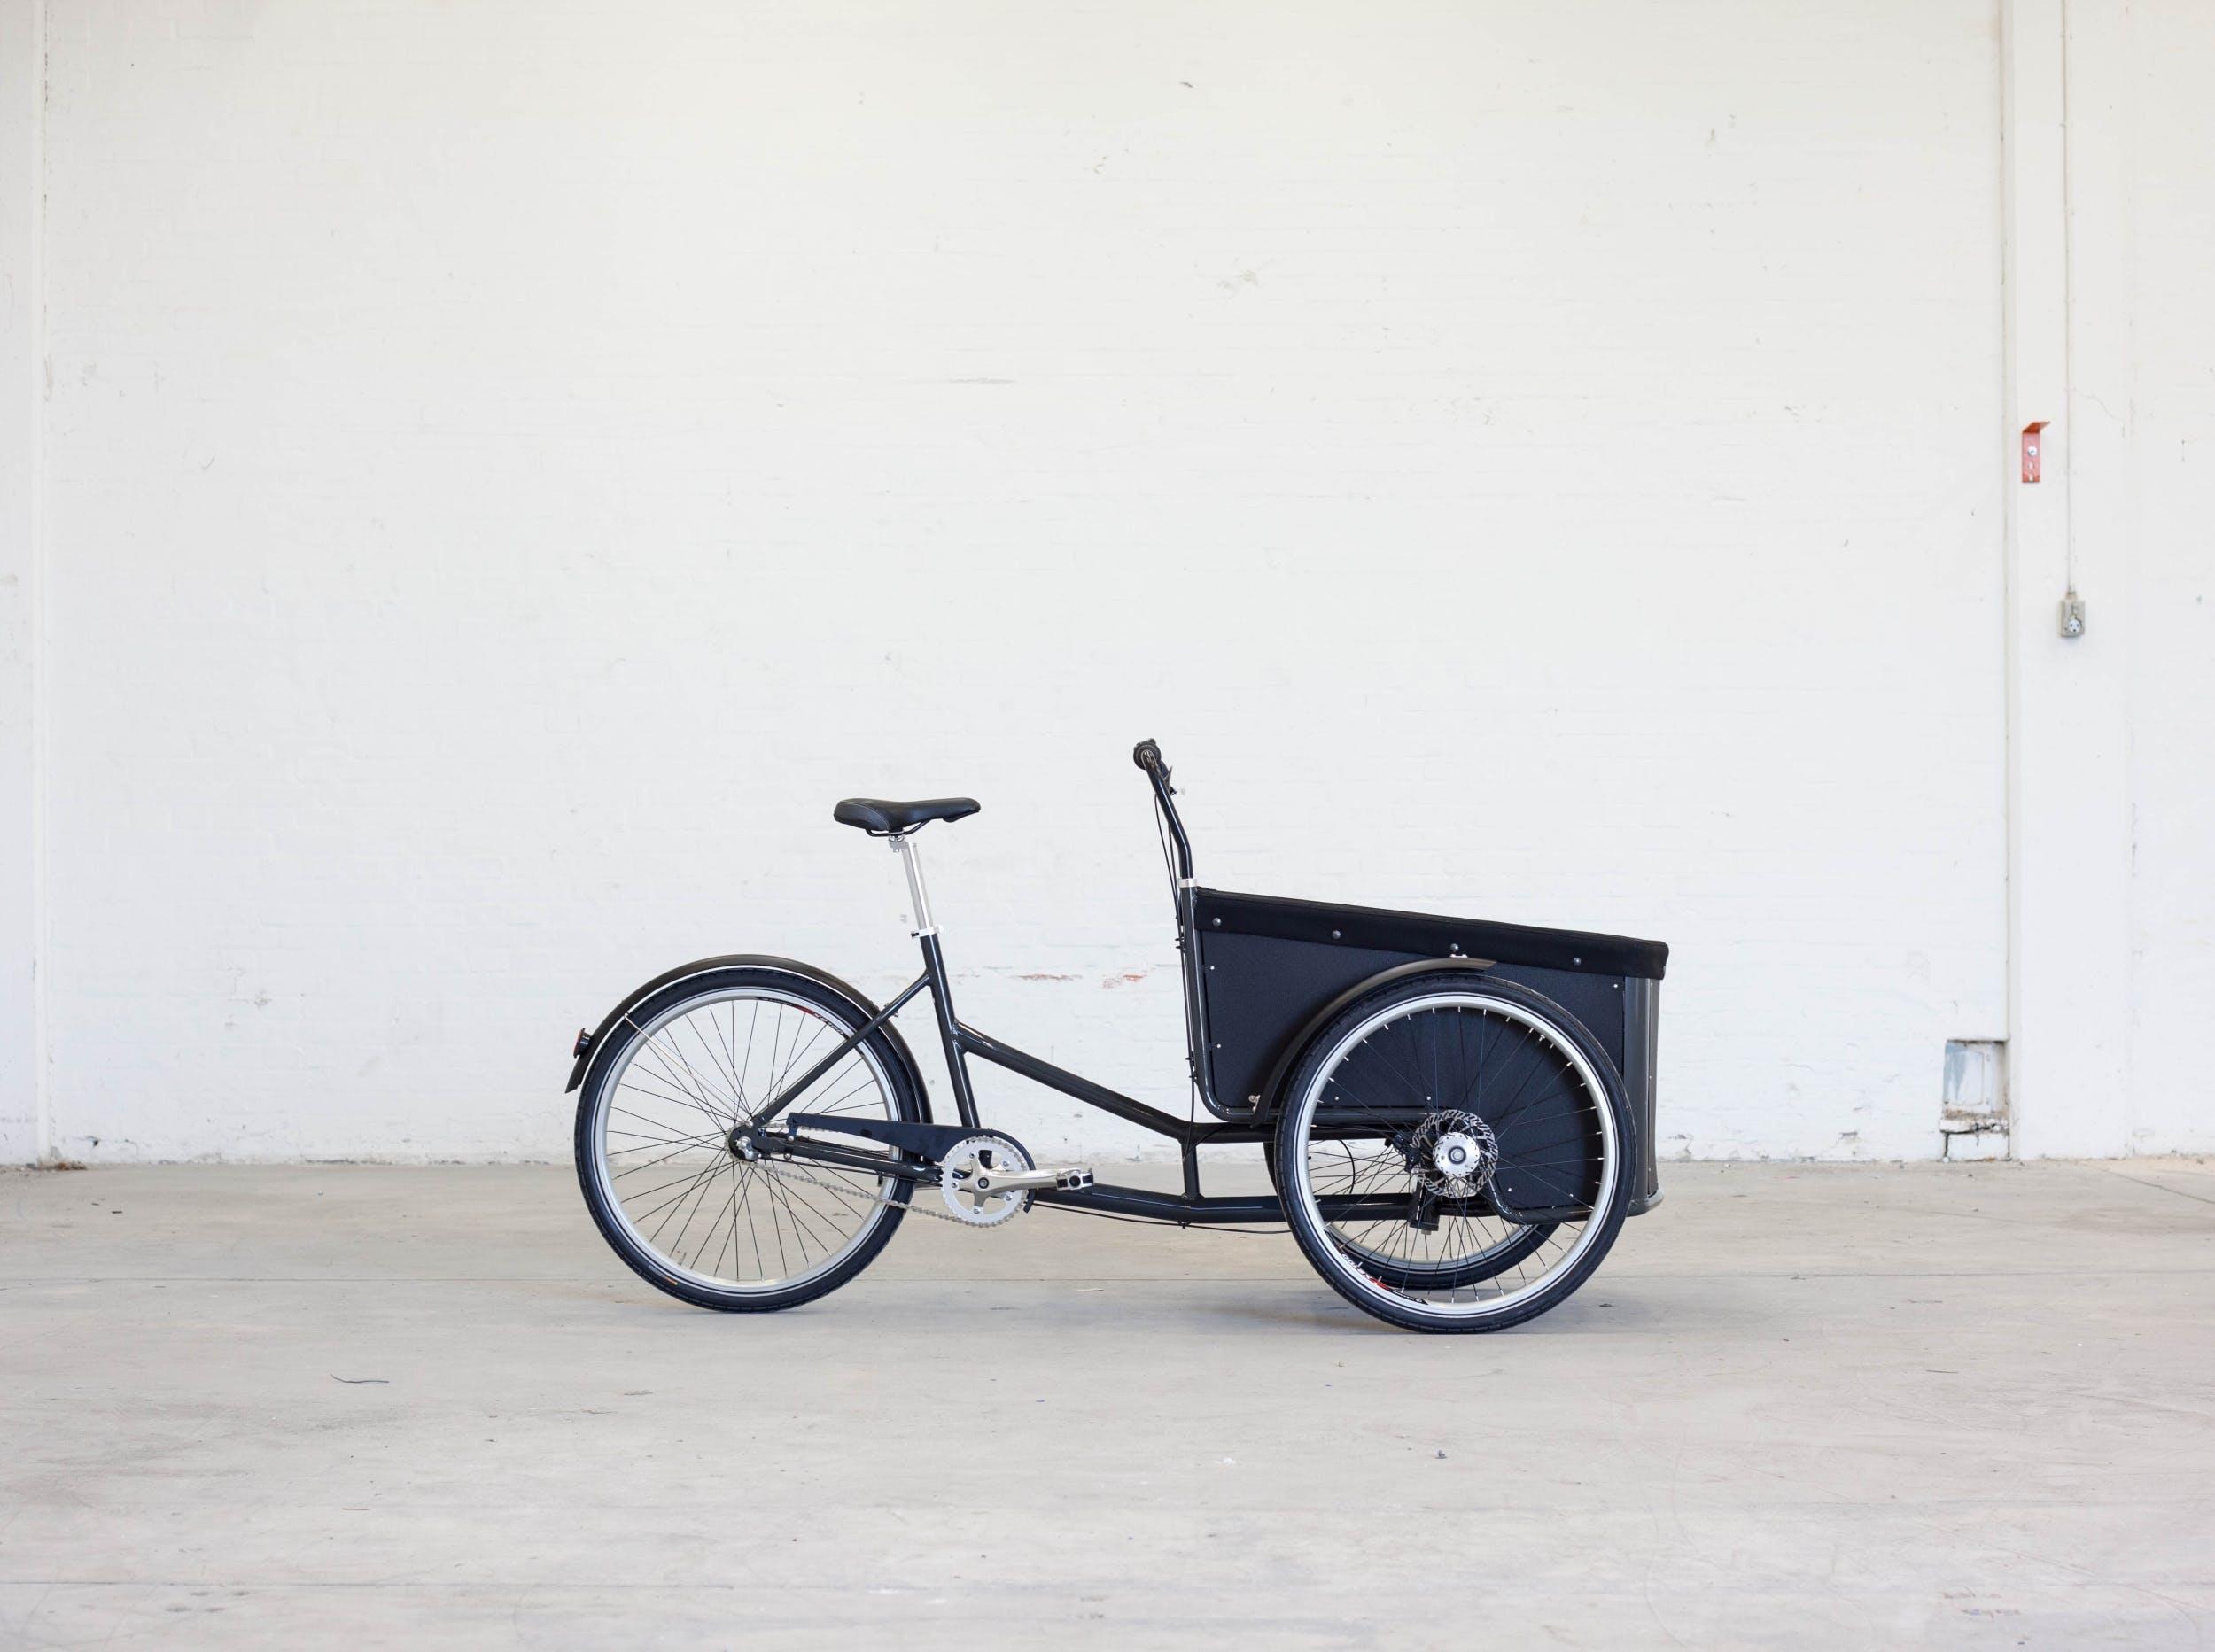 bürgersteig, fahrrad, gehweg